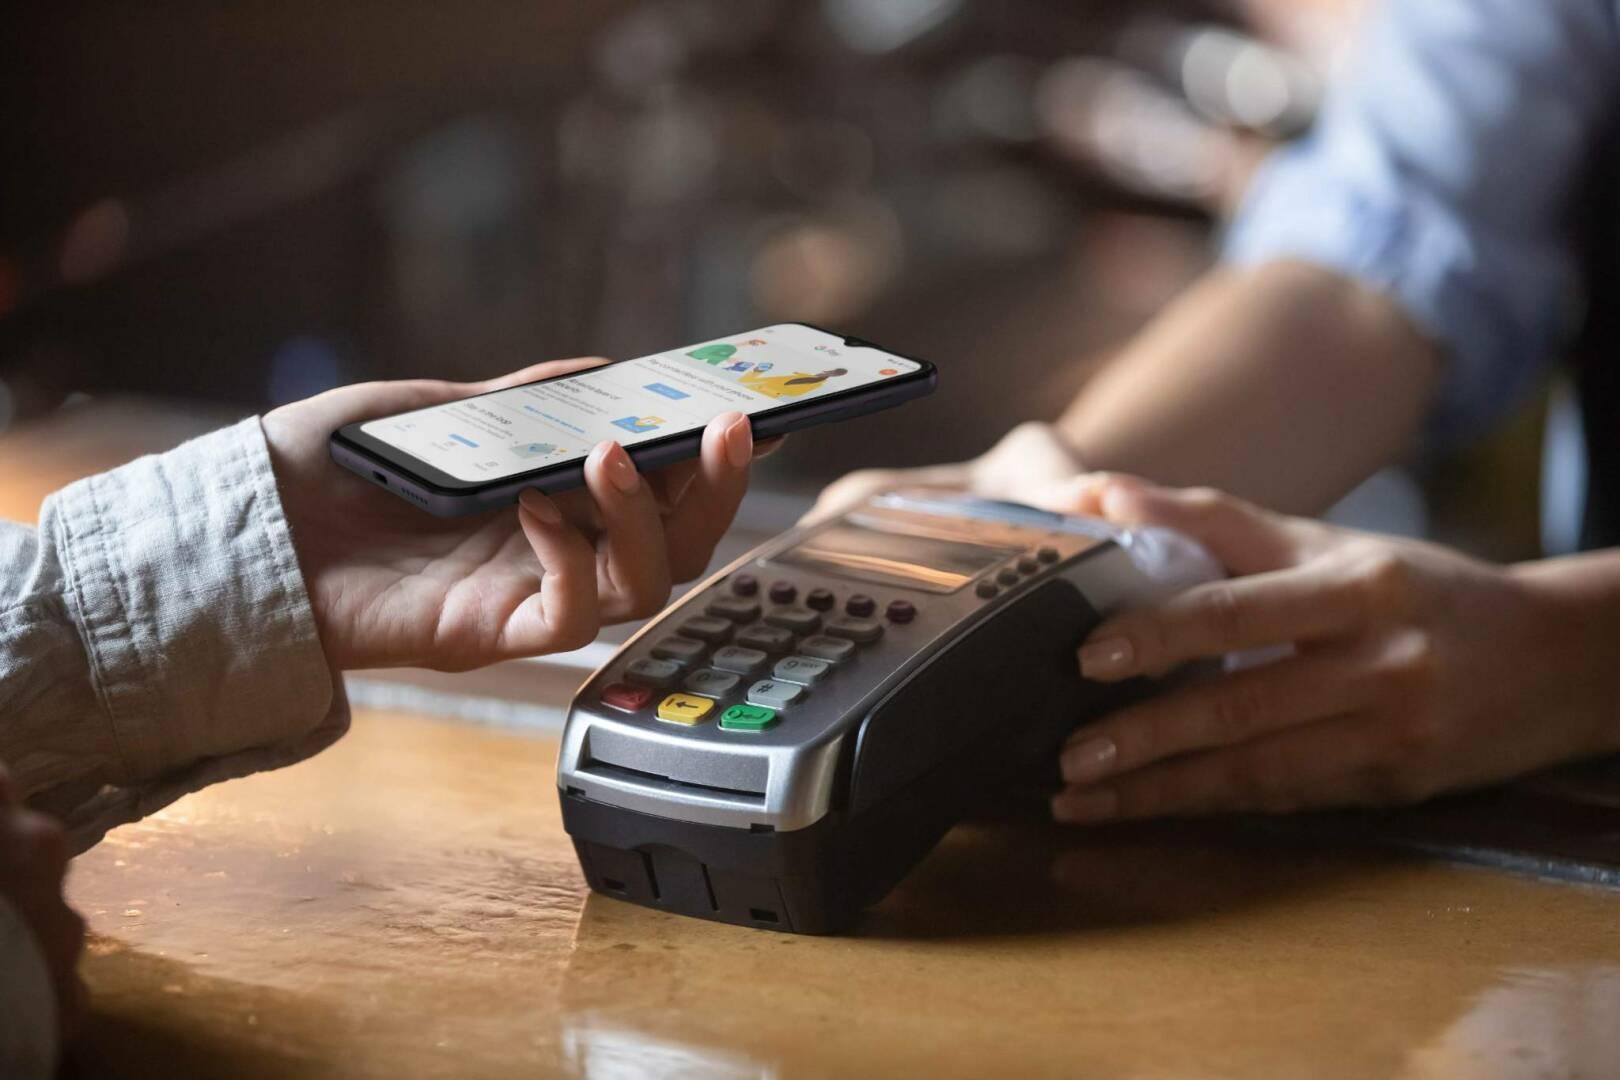 pagamenti NFC - Motorola